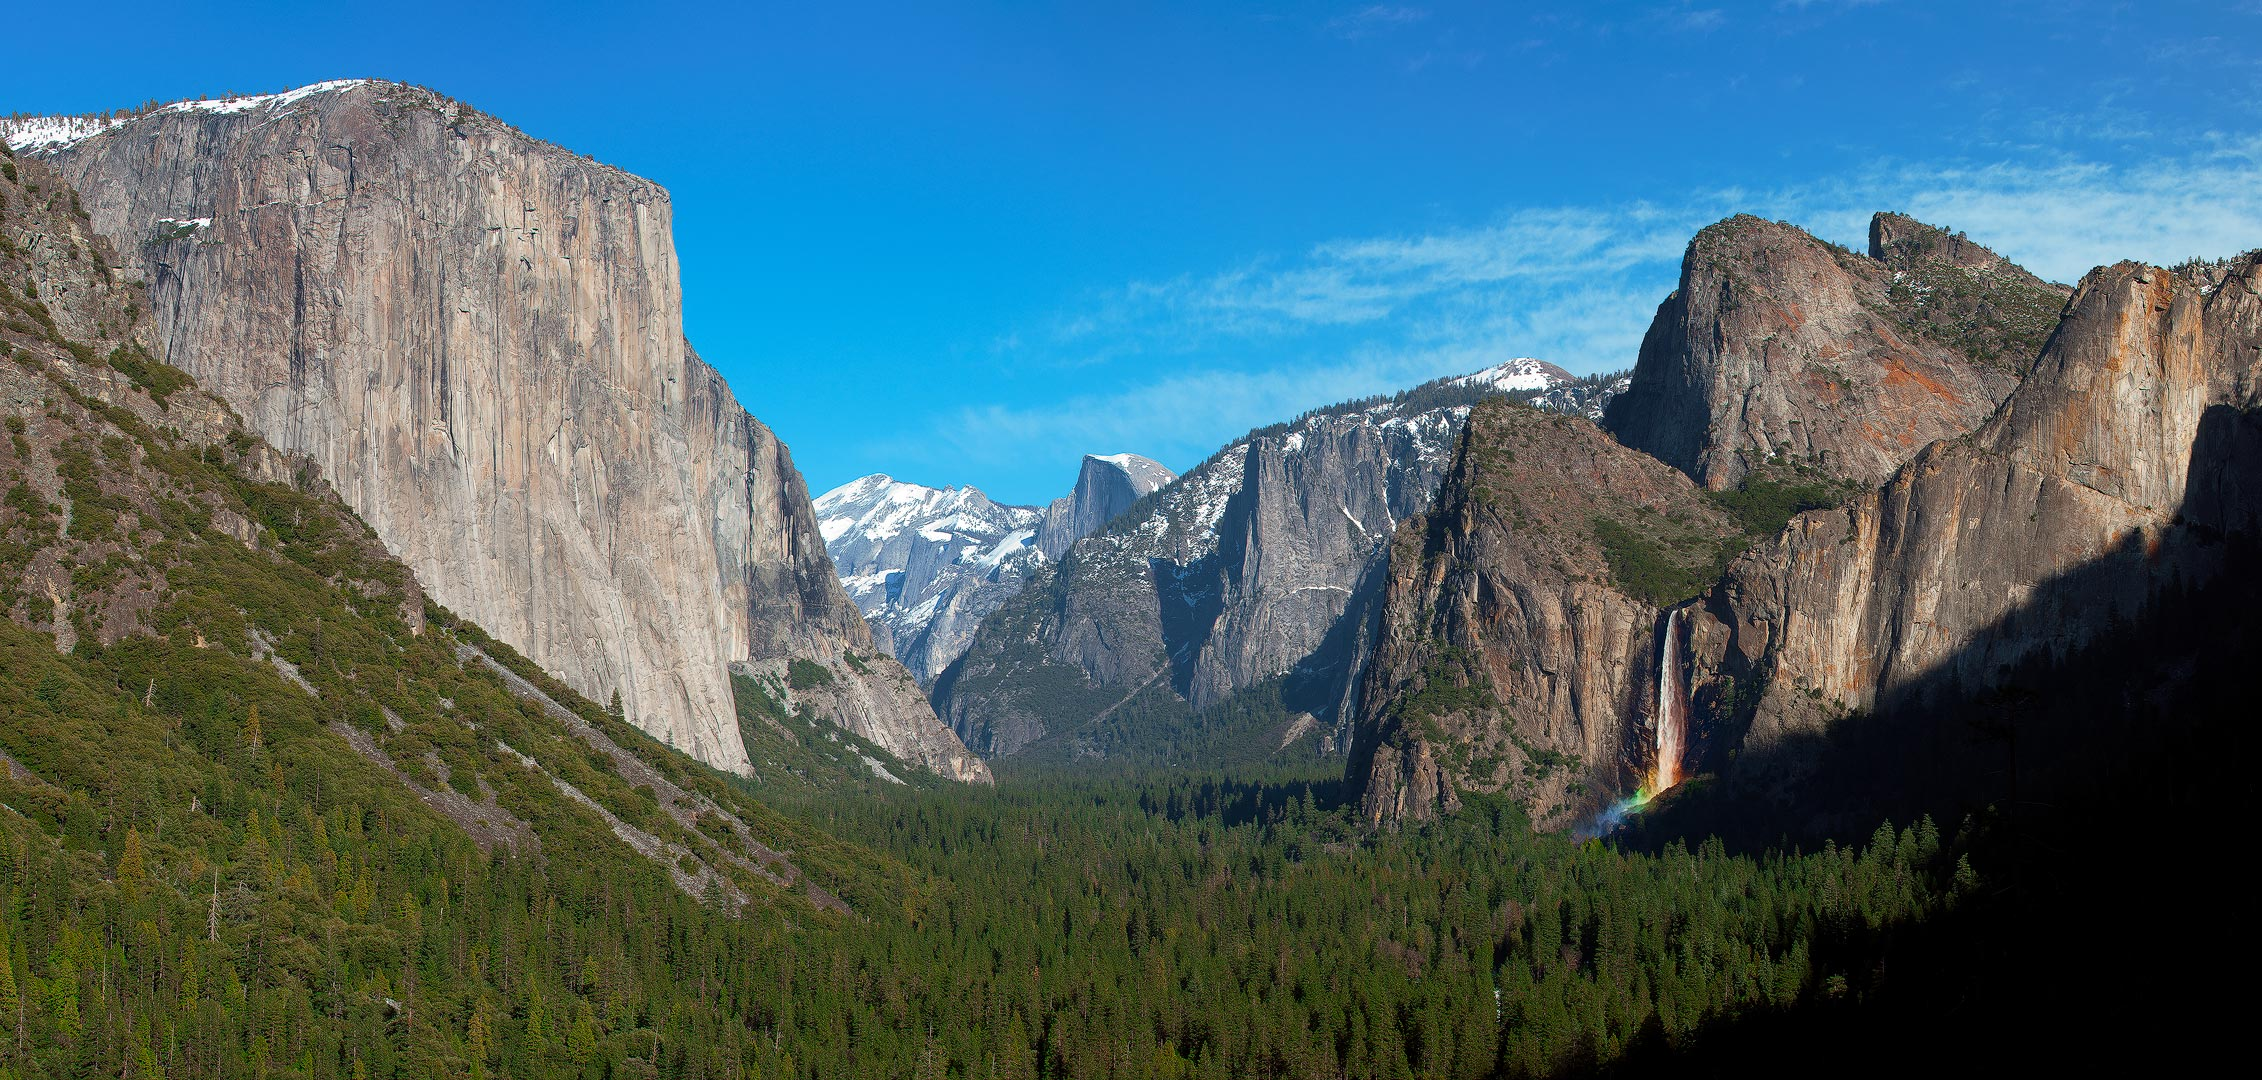 Yosemite, National Park, California, Winter, Landscape, Snow, Mountains, Waterfalls, Rivers, Vista, Iconic, Bridalveil Fall, El Capitan, Half Dome,  Tunnel View, Sequoias, Tuolumne, Mariposa, Glacier,, photo